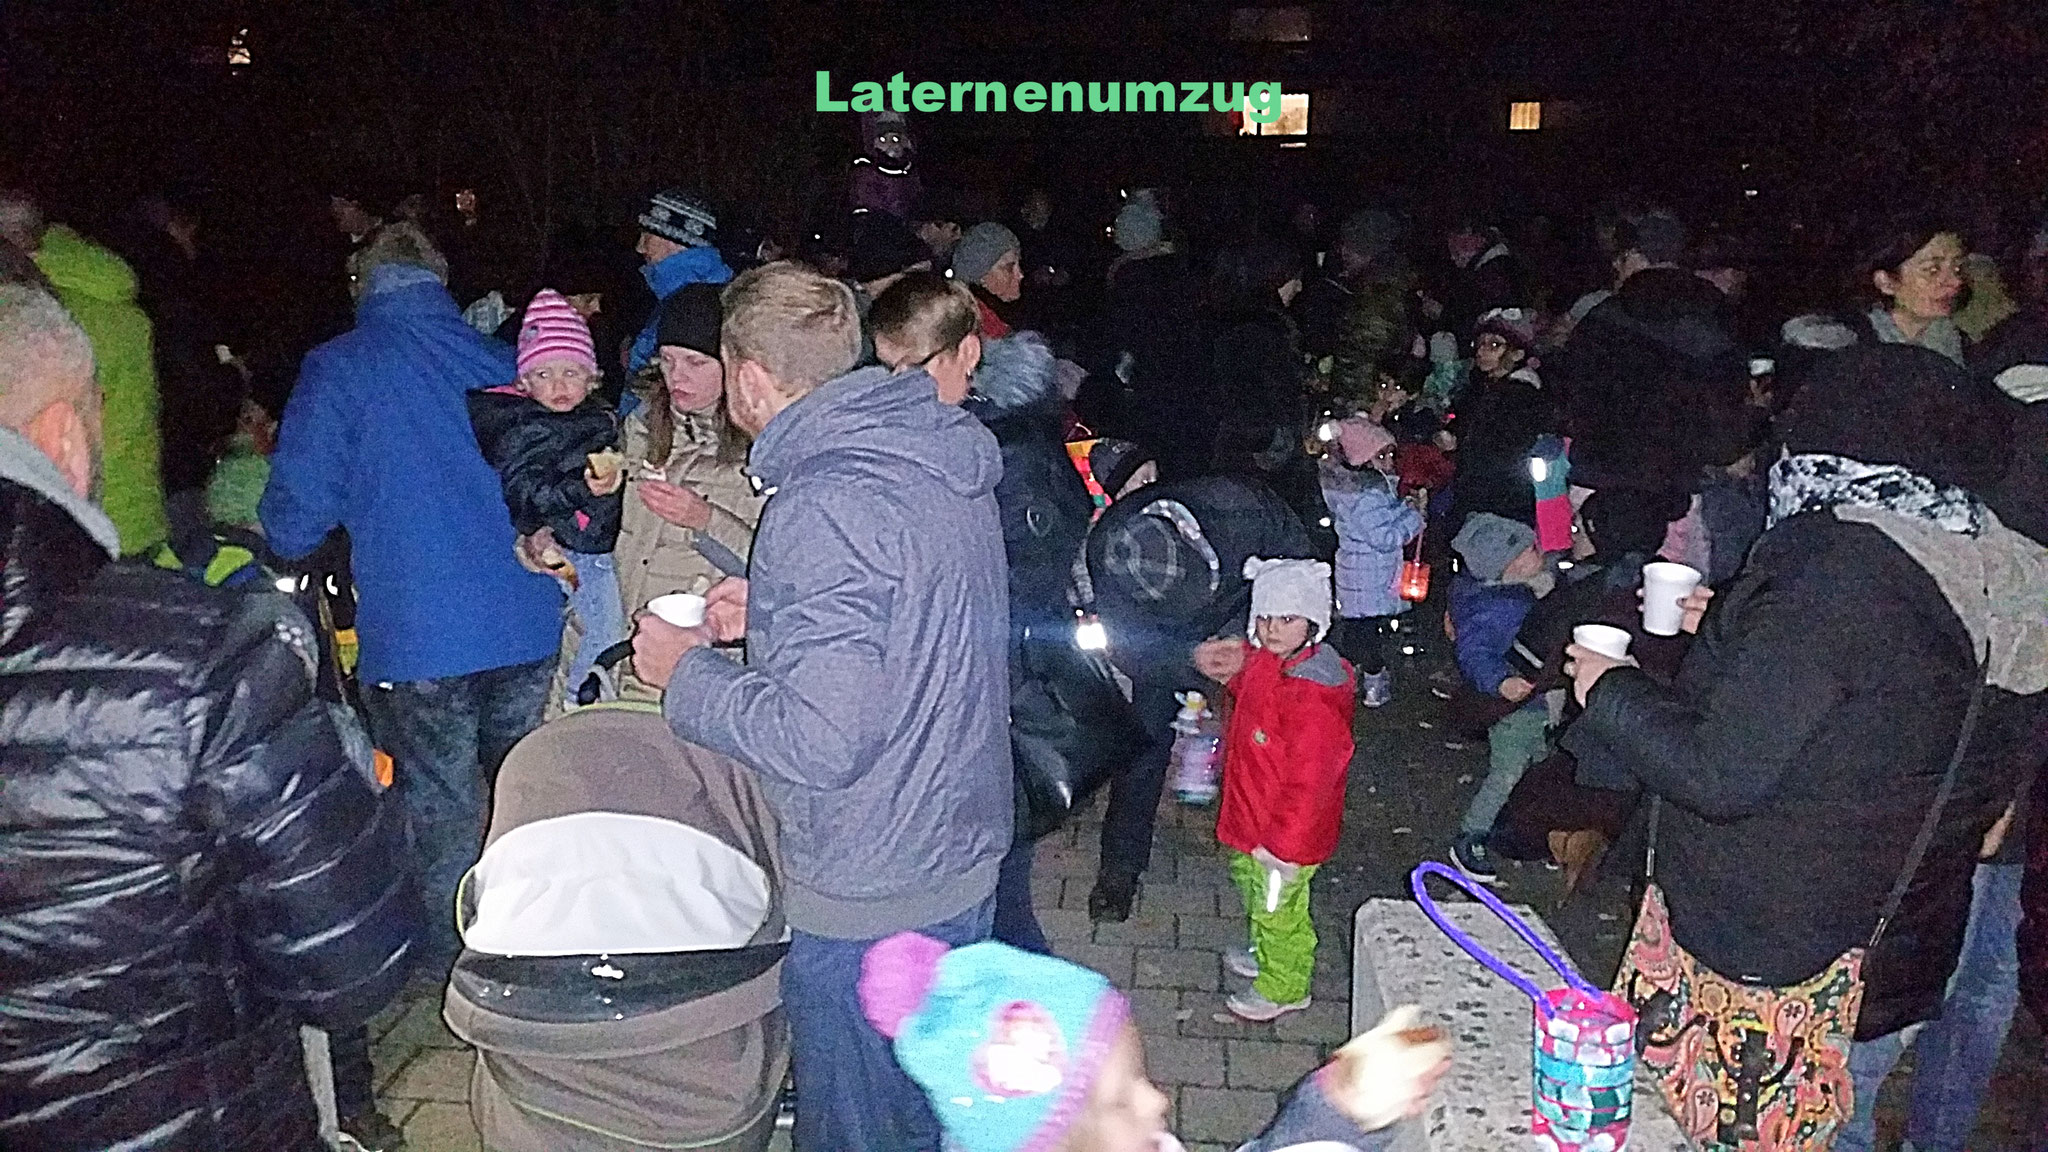 Laternenumzug 2017